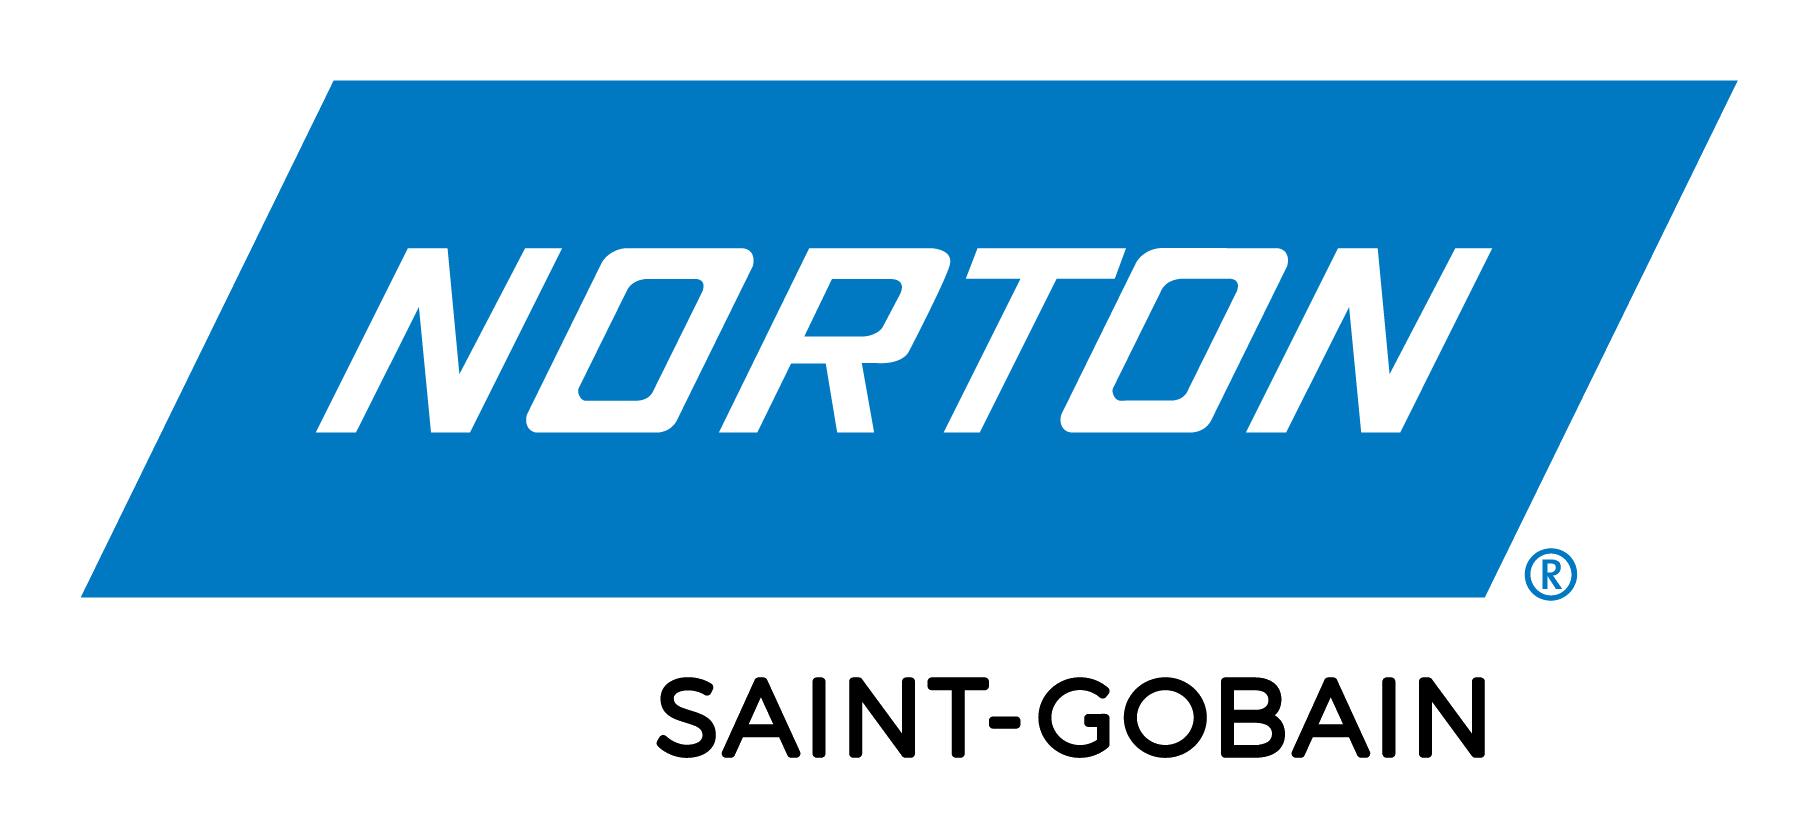 SG_Norton_logo_rgb_14